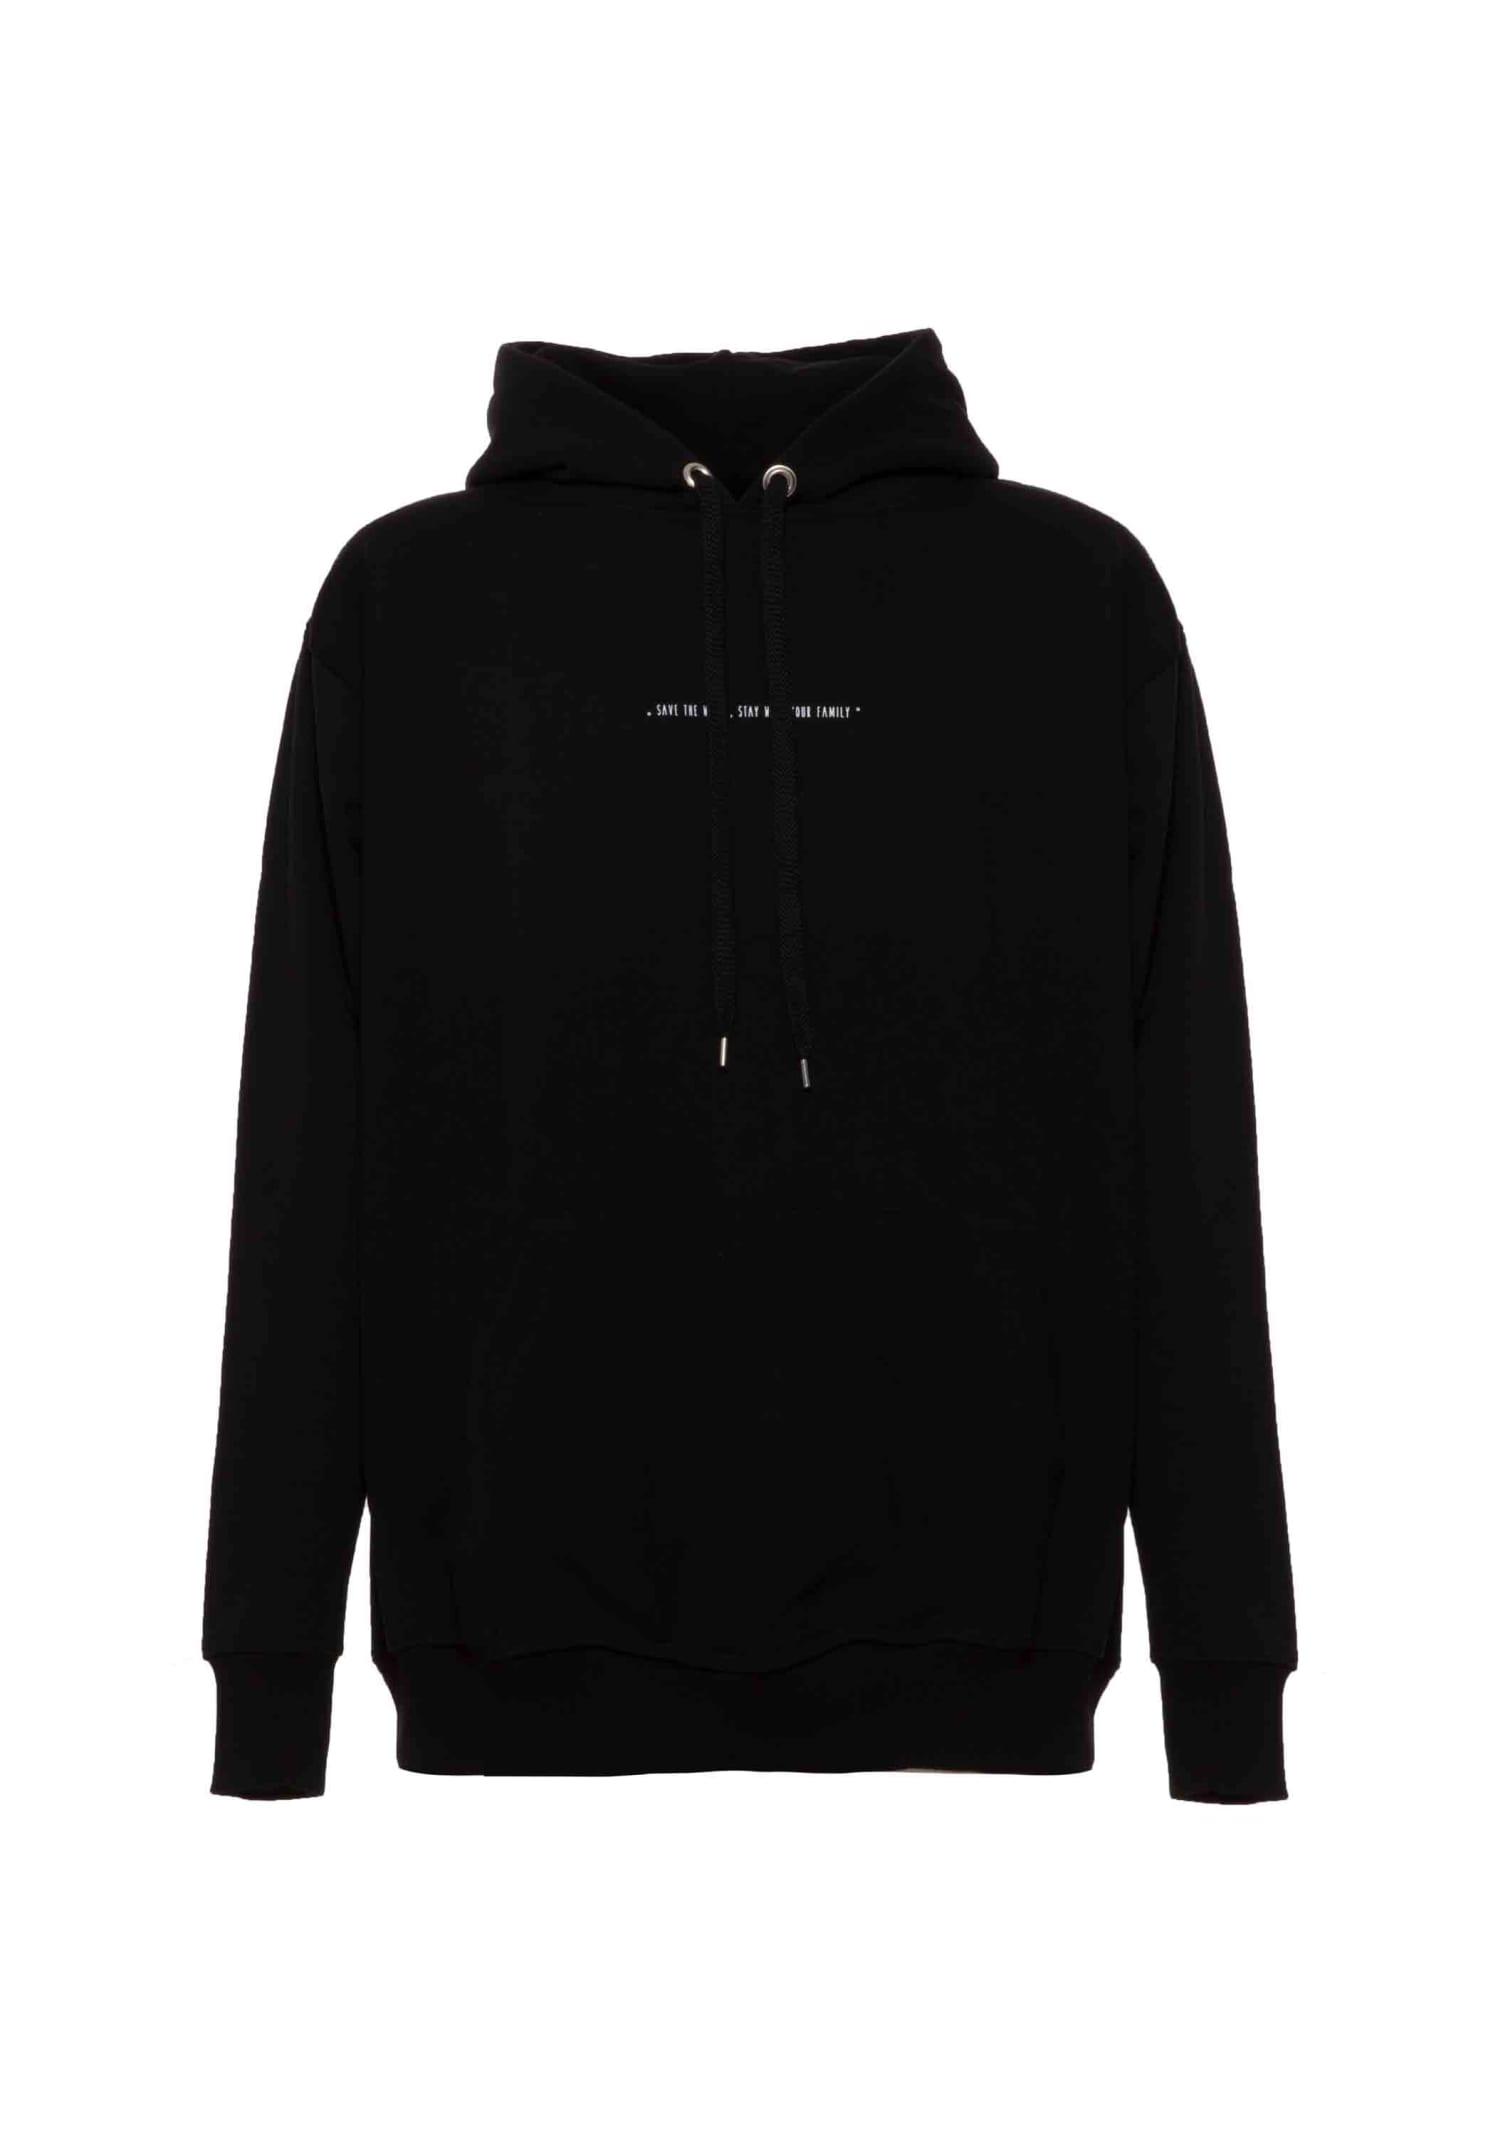 Hoodie Iconic Black